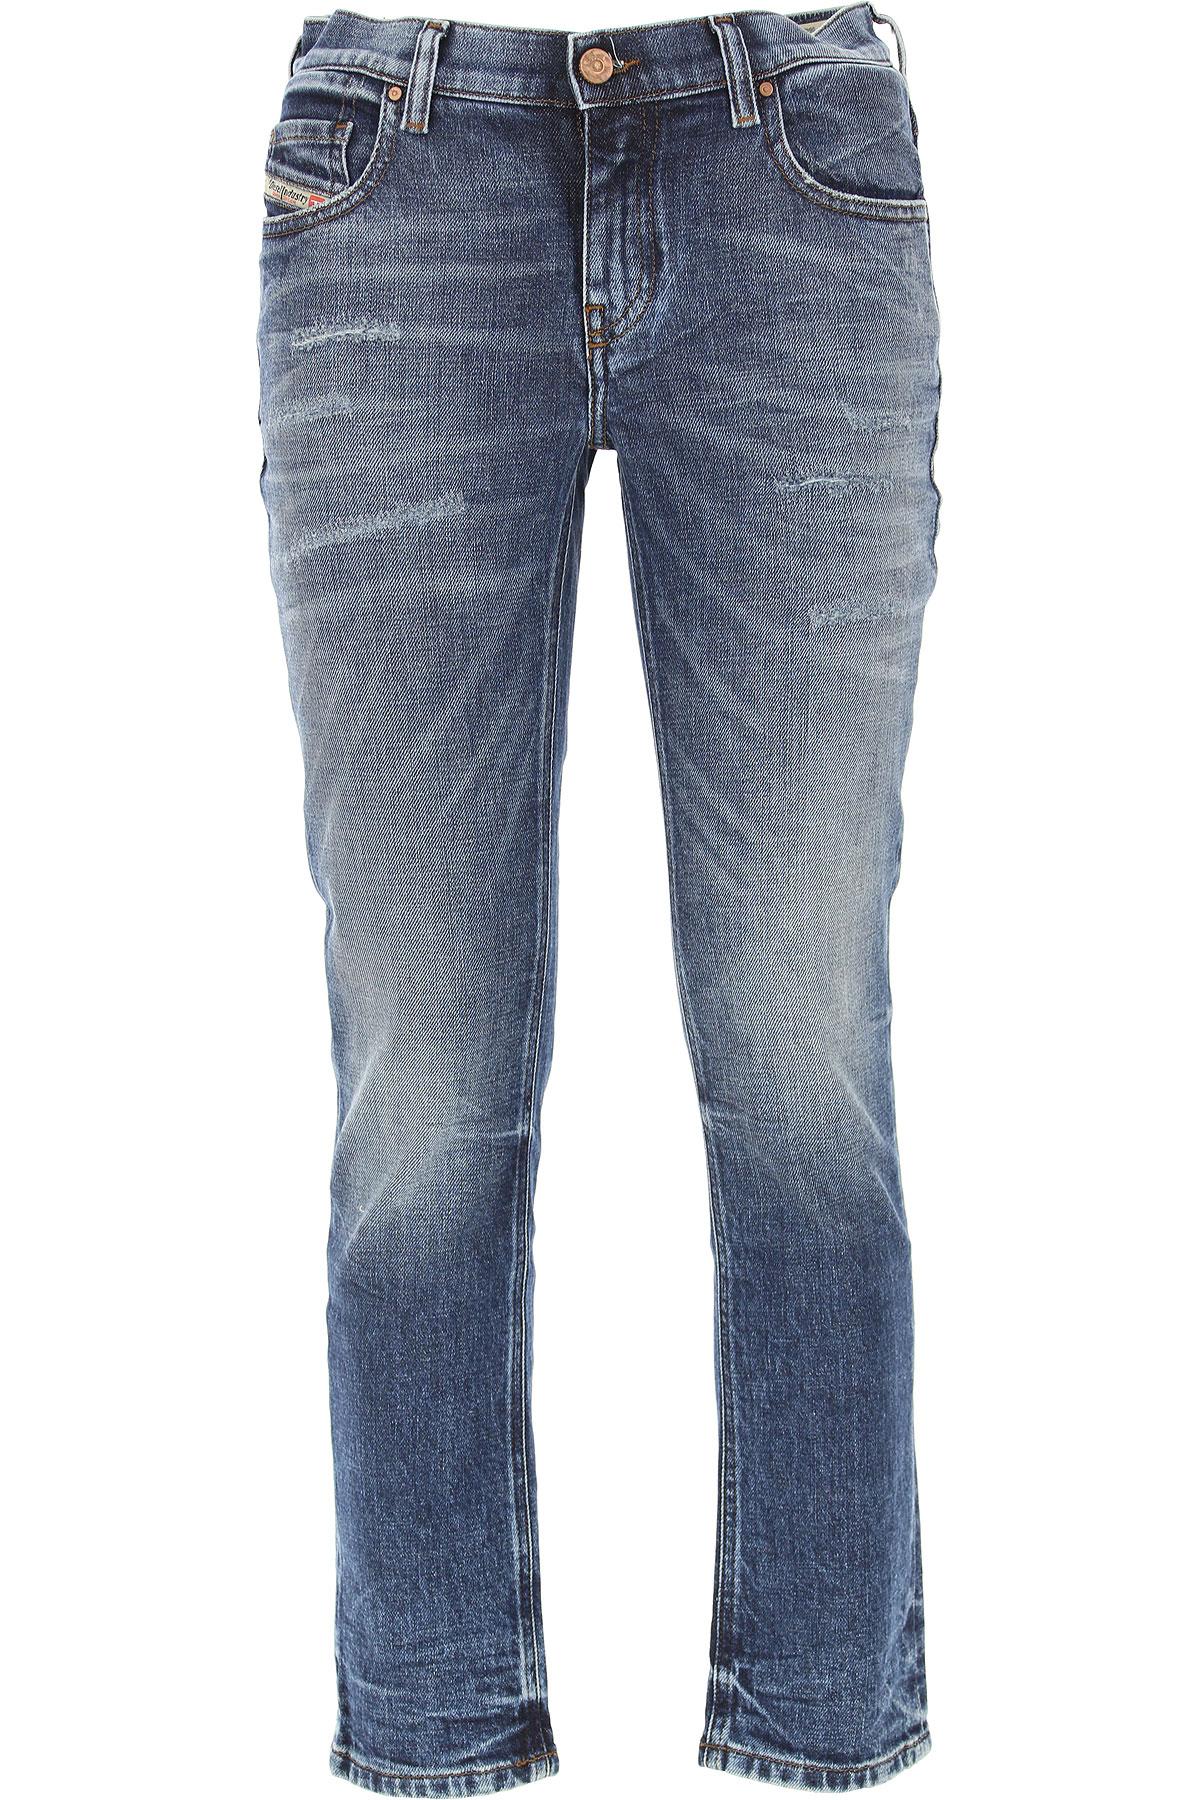 Diesel Jeans On Sale, Blue Denim, Cotton, 2017, 26 27 28 31